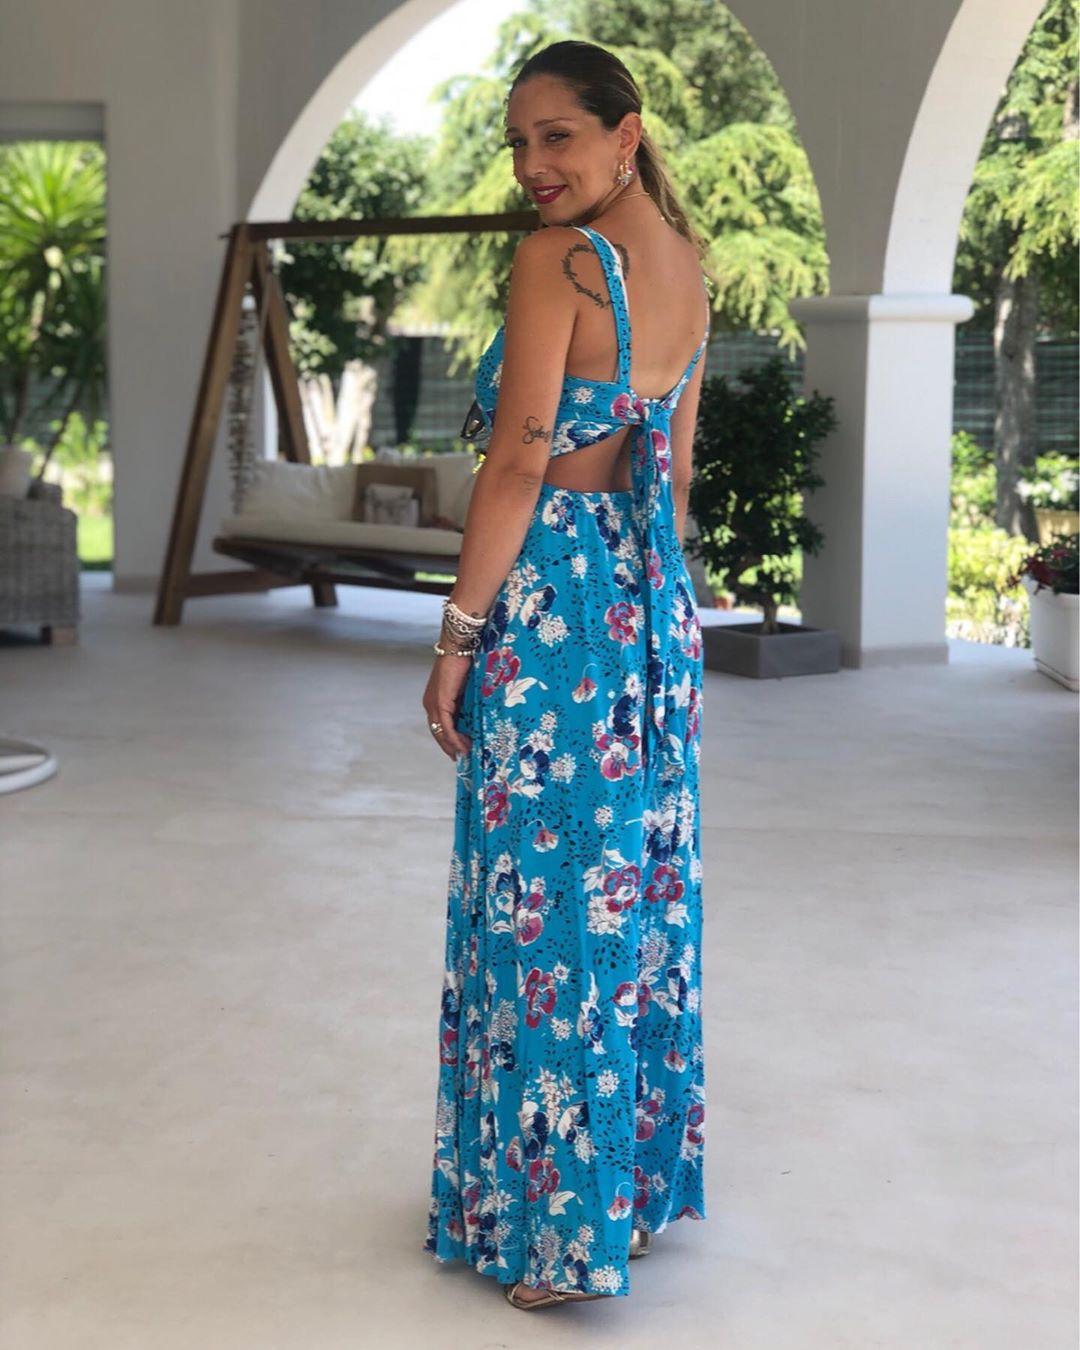 dress with print and straps de Zara sur valeryfabienbalestra